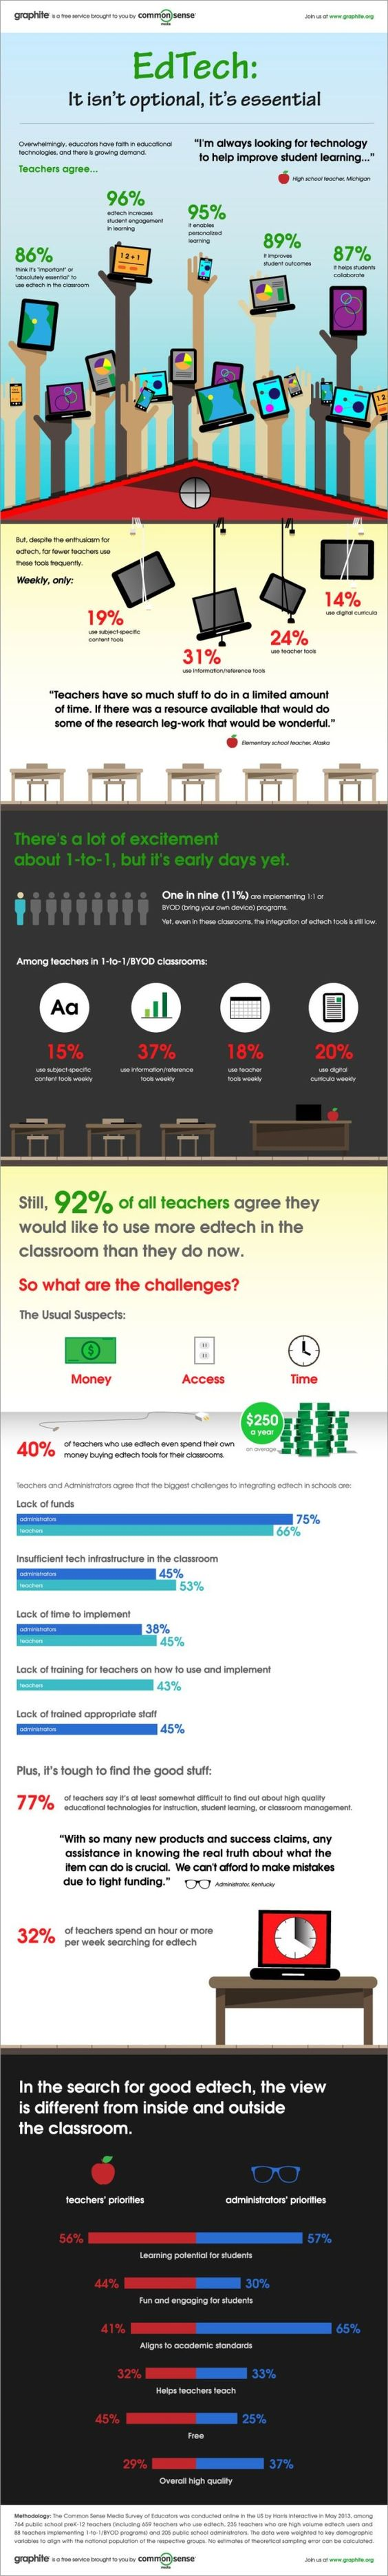 Best 25 Educational technology ideas on Pinterest